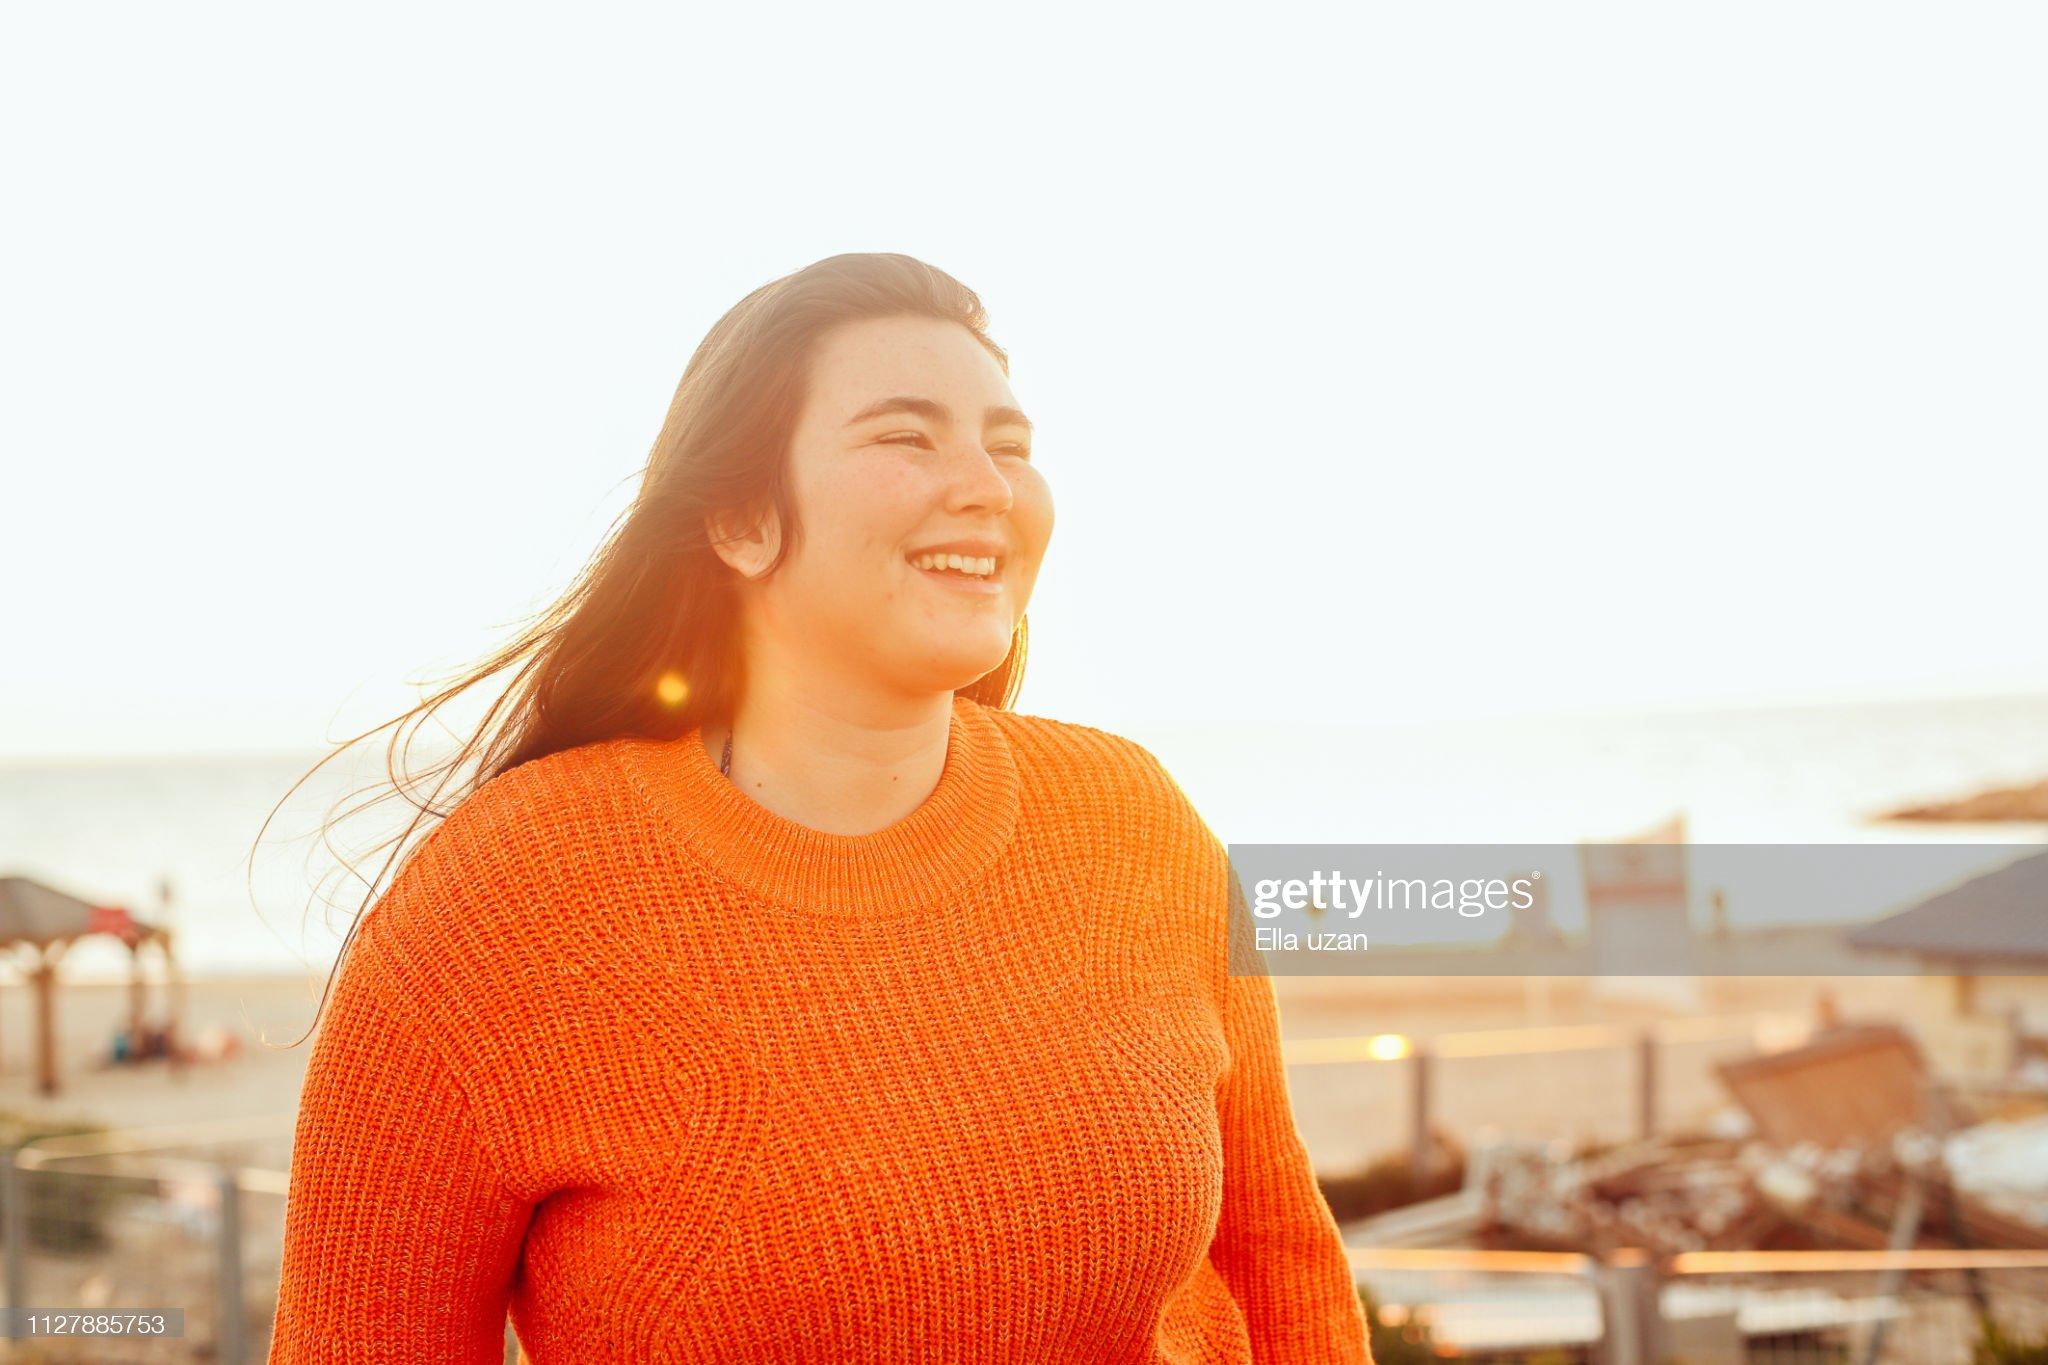 Cheerful girl walking outdoors : Stock Photo